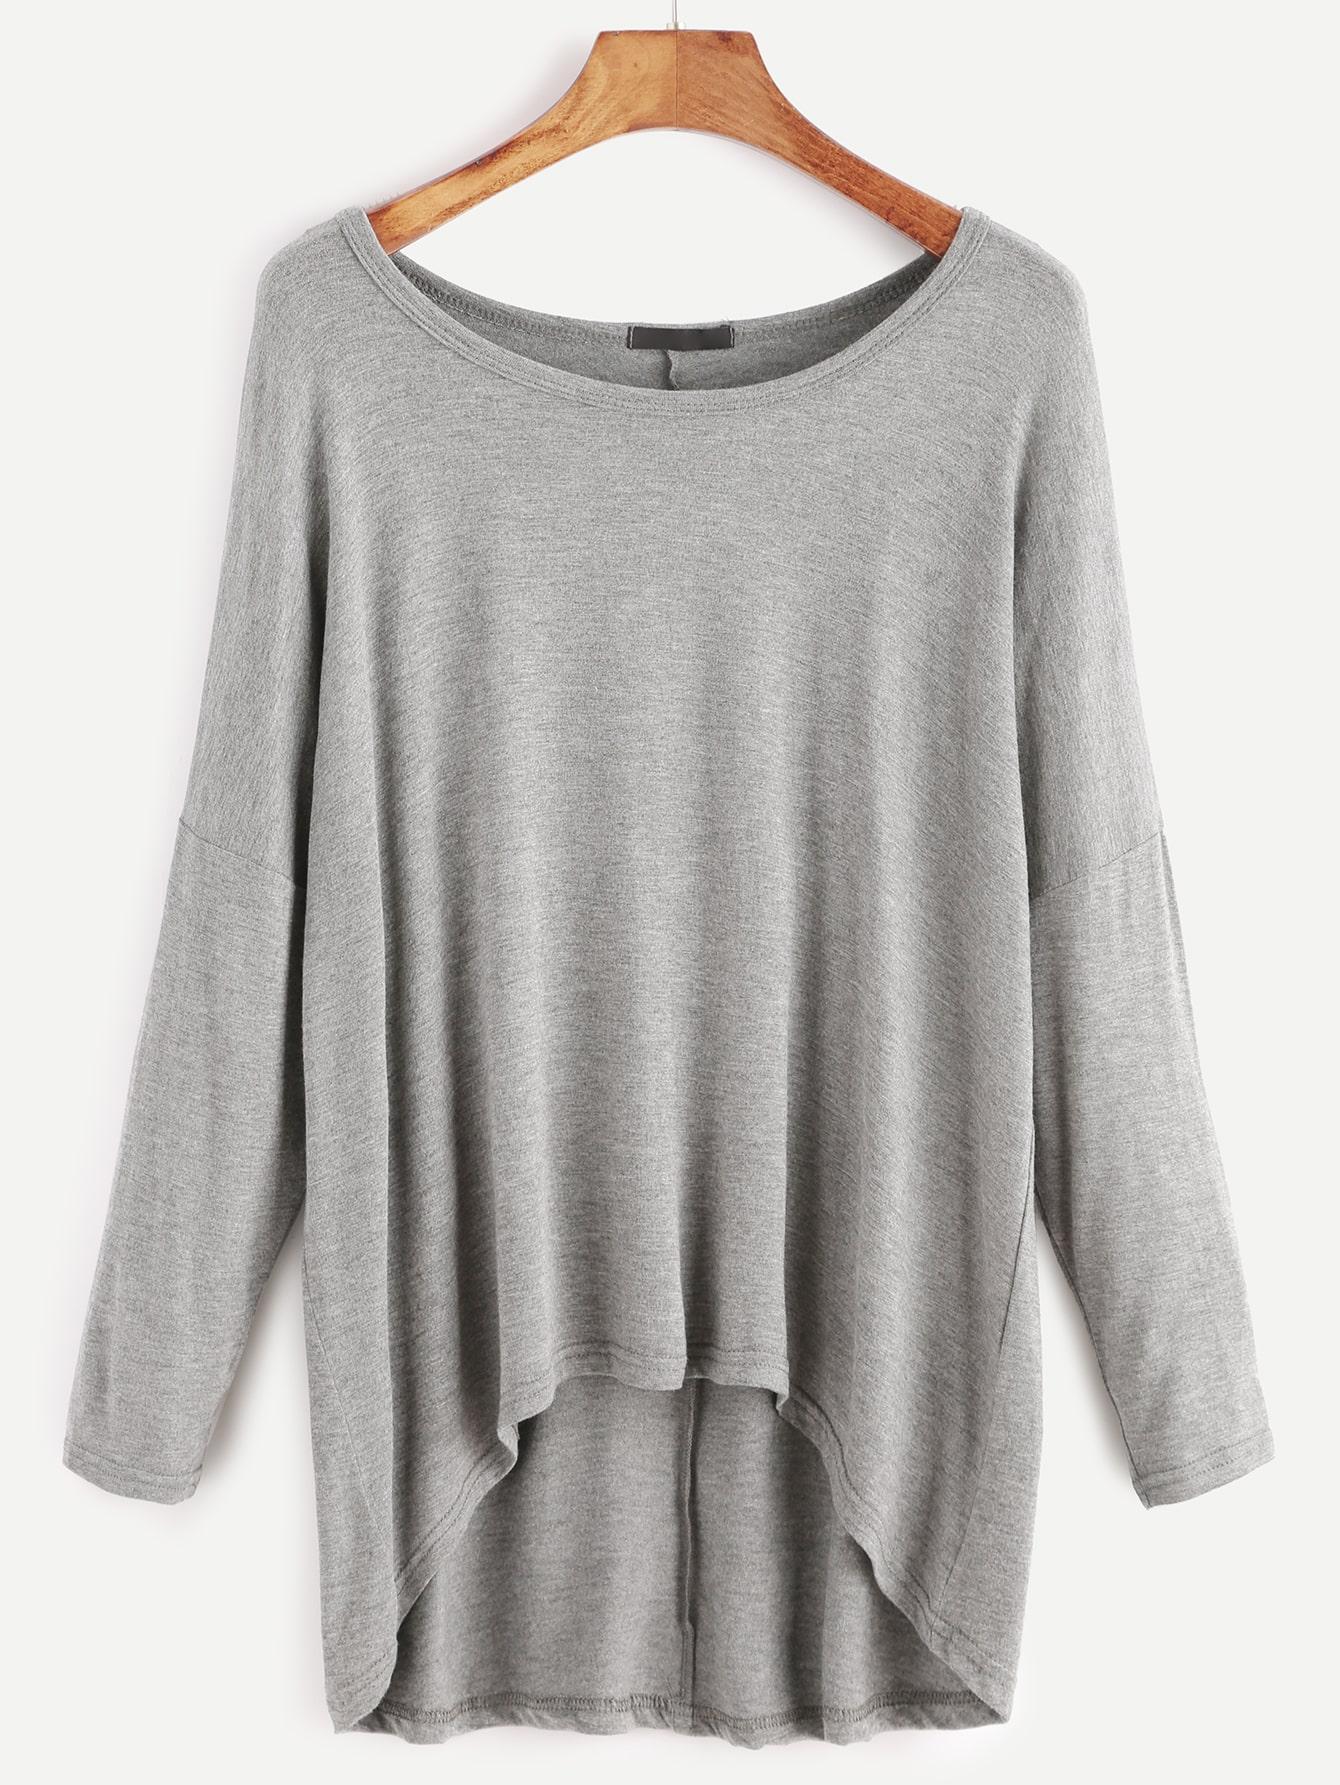 Grey Drop Shoulder Dip Hem T-shirt tee161117301